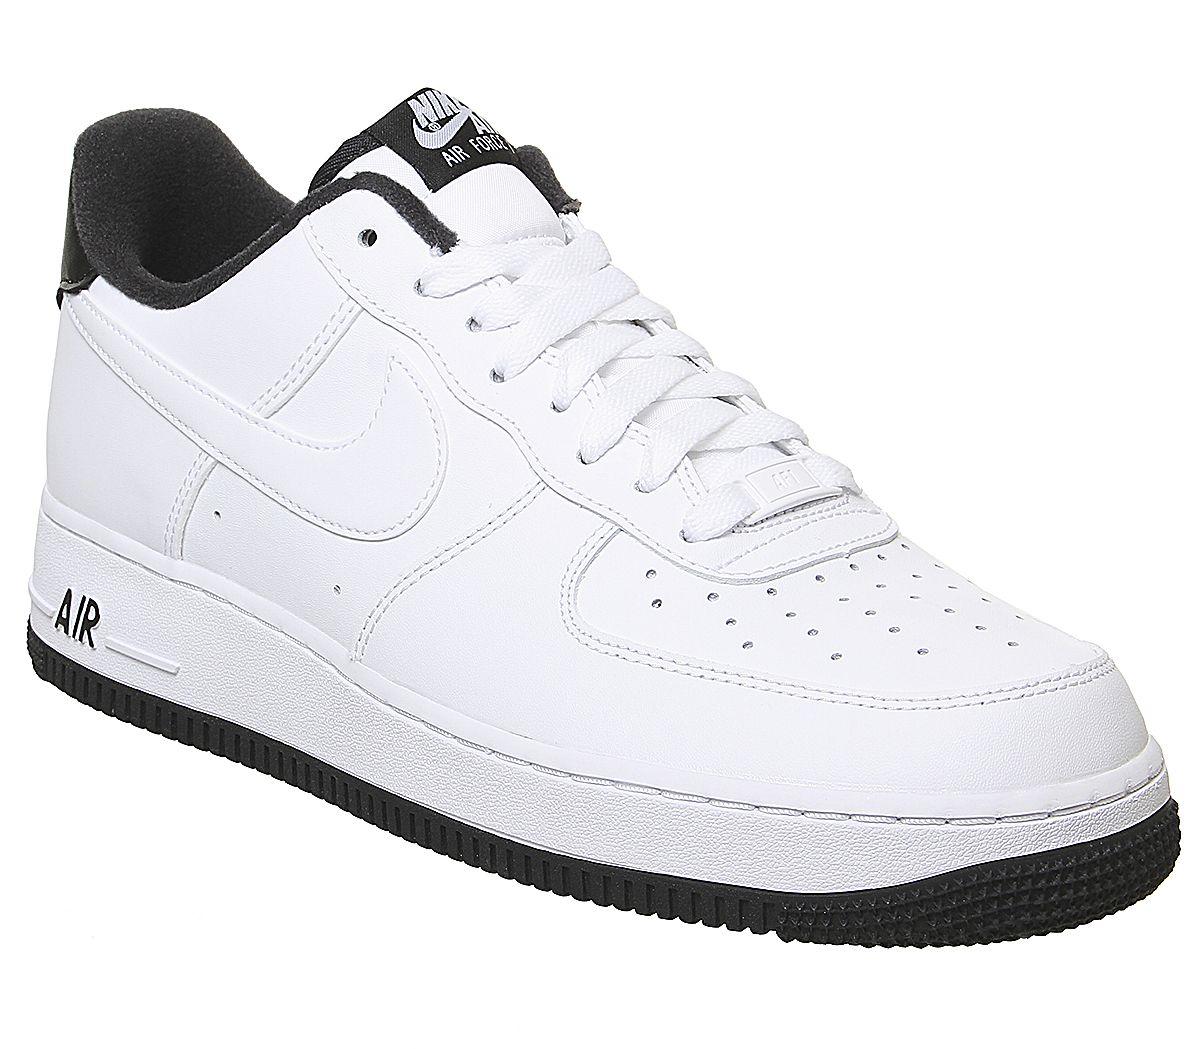 Nike Sportswear Air Force 1 07 White/Black   315115 152